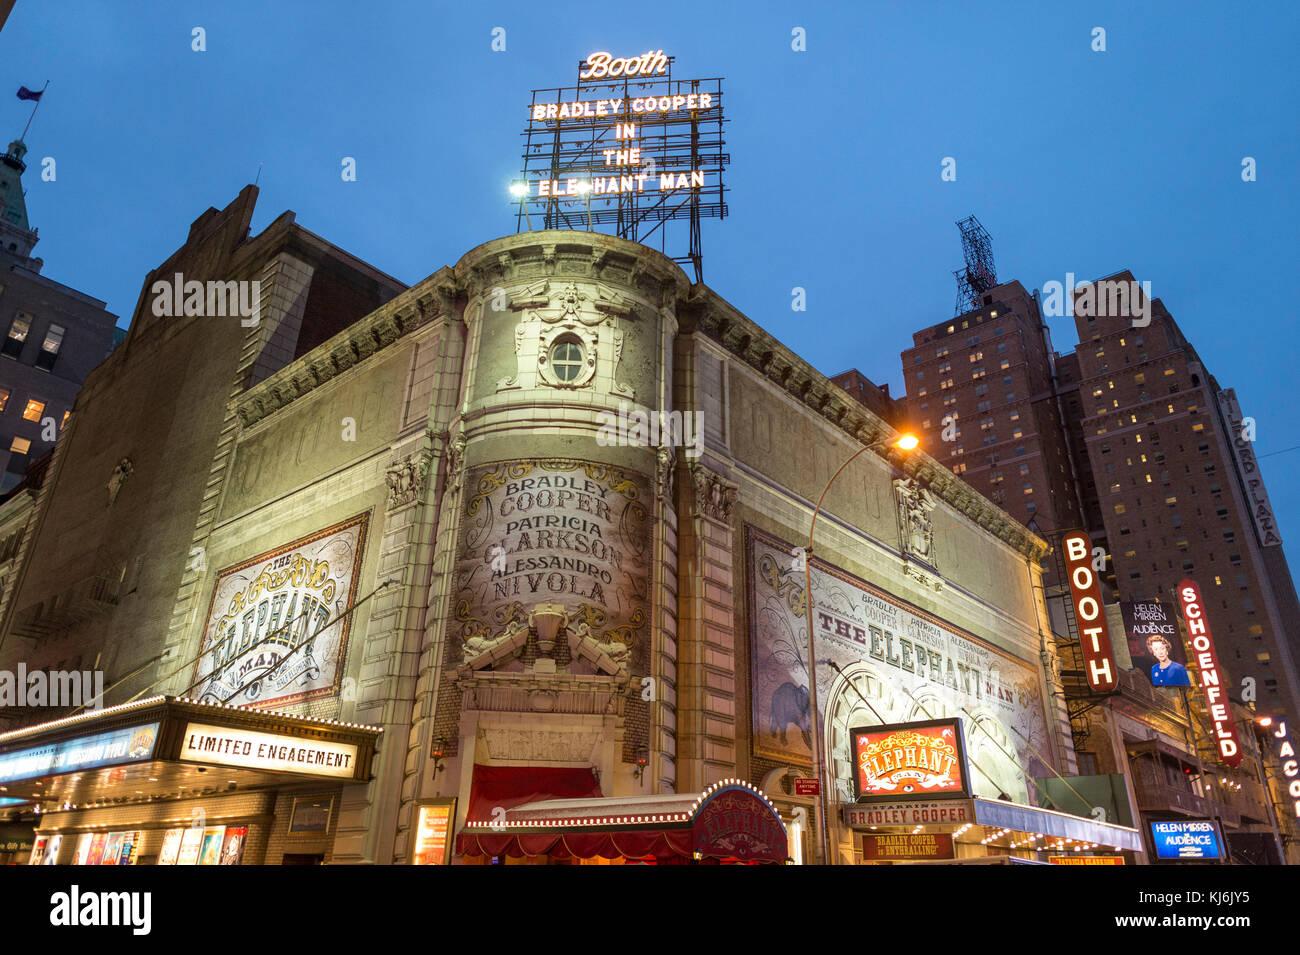 Broadway Theatre Stock Photos & Broadway Theatre Stock Images - Alamy